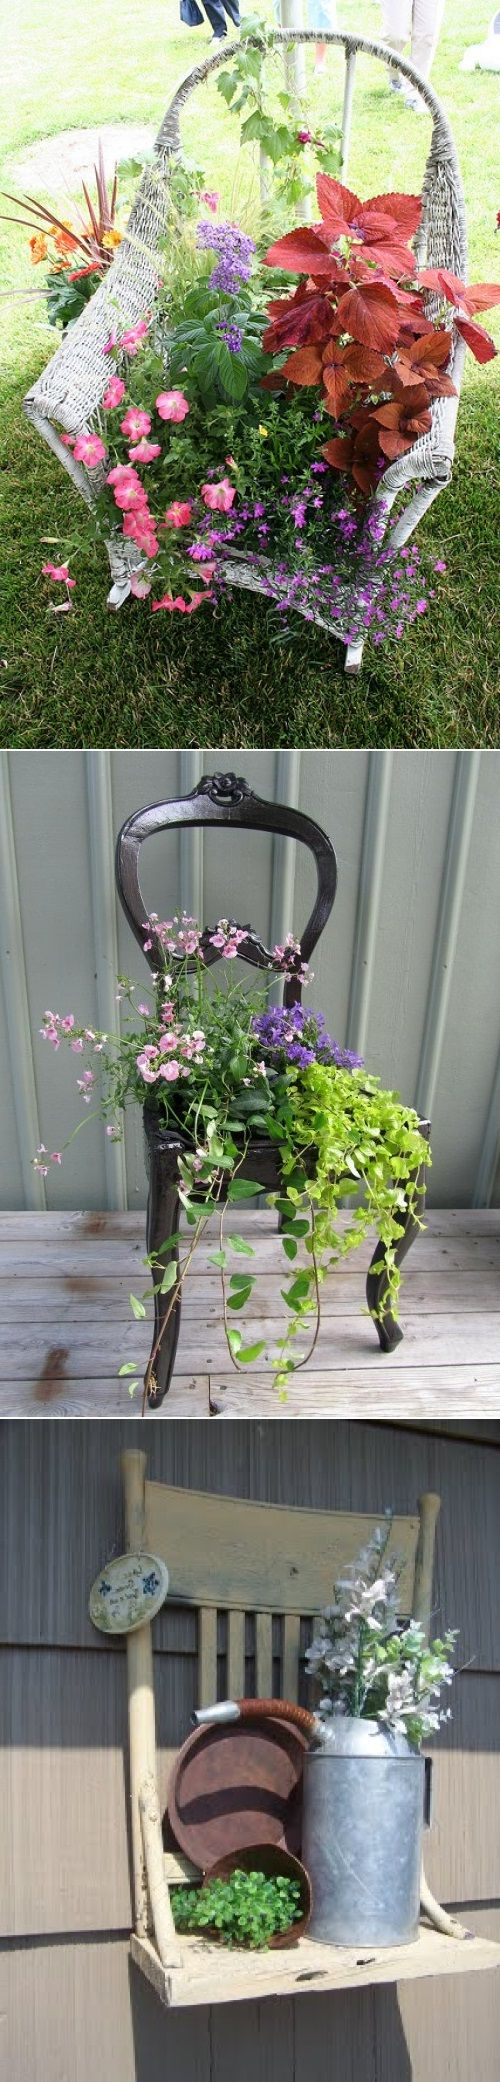 DIY Mini Garden ideas